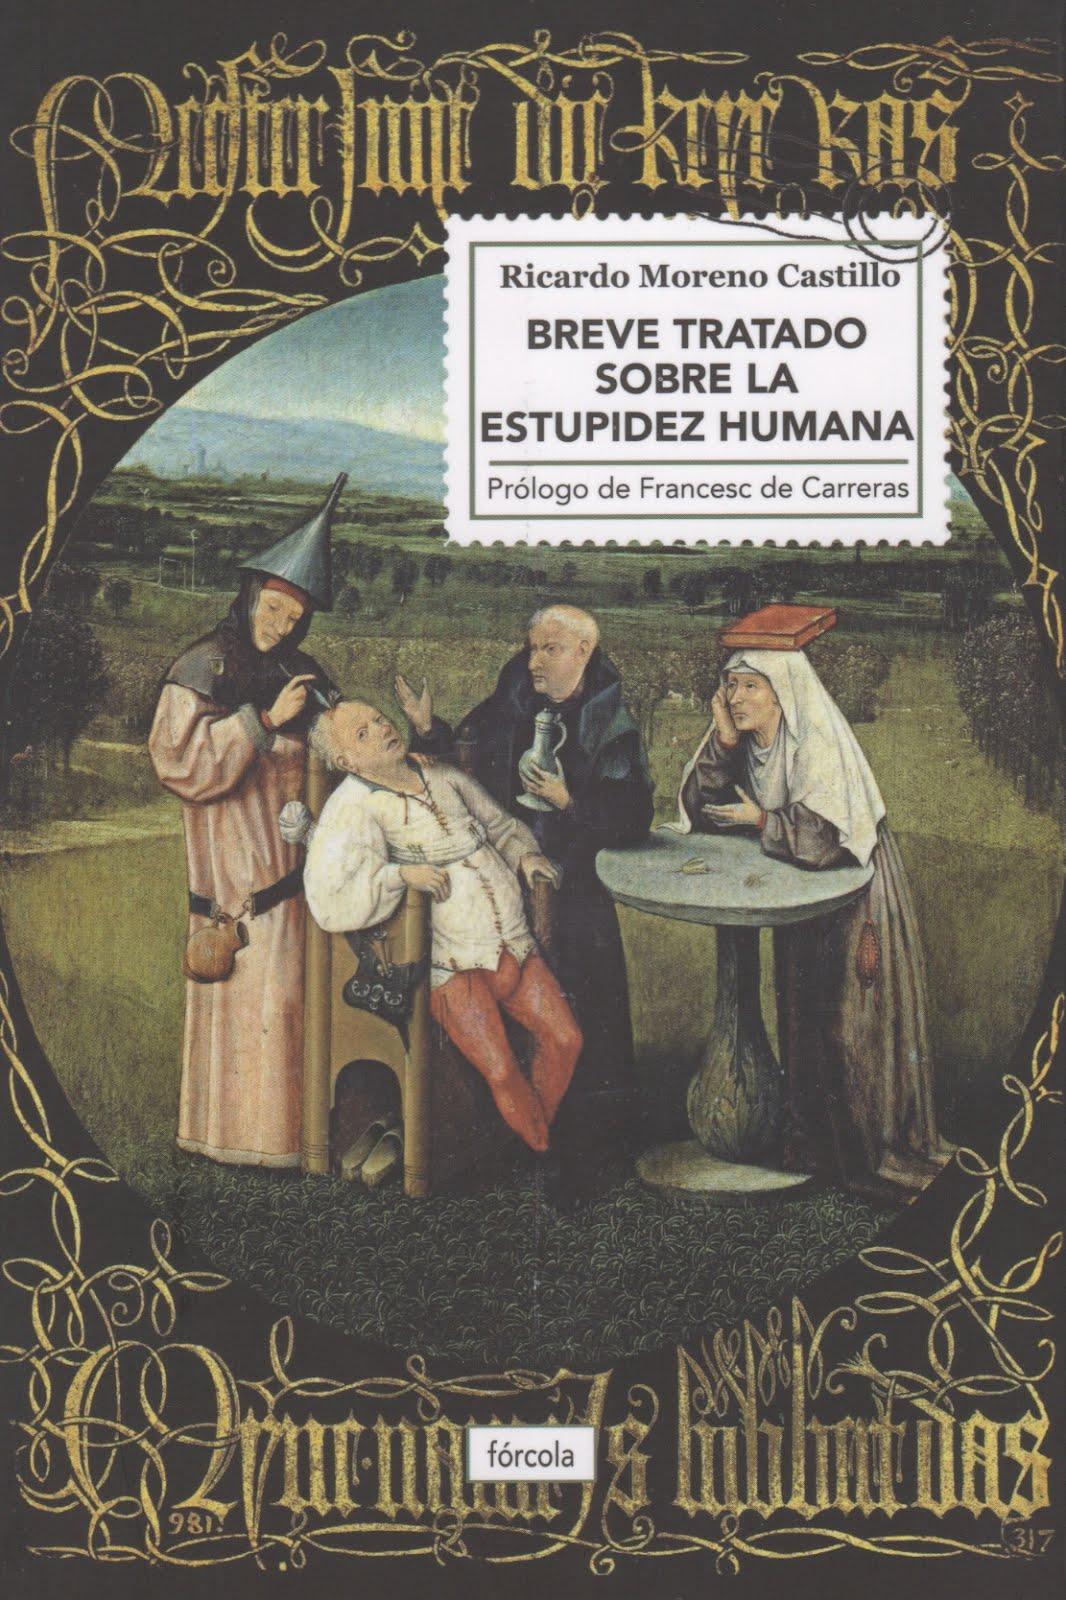 Ricardo Moreno Castillo (Breve tratado sobre la estupidez humana